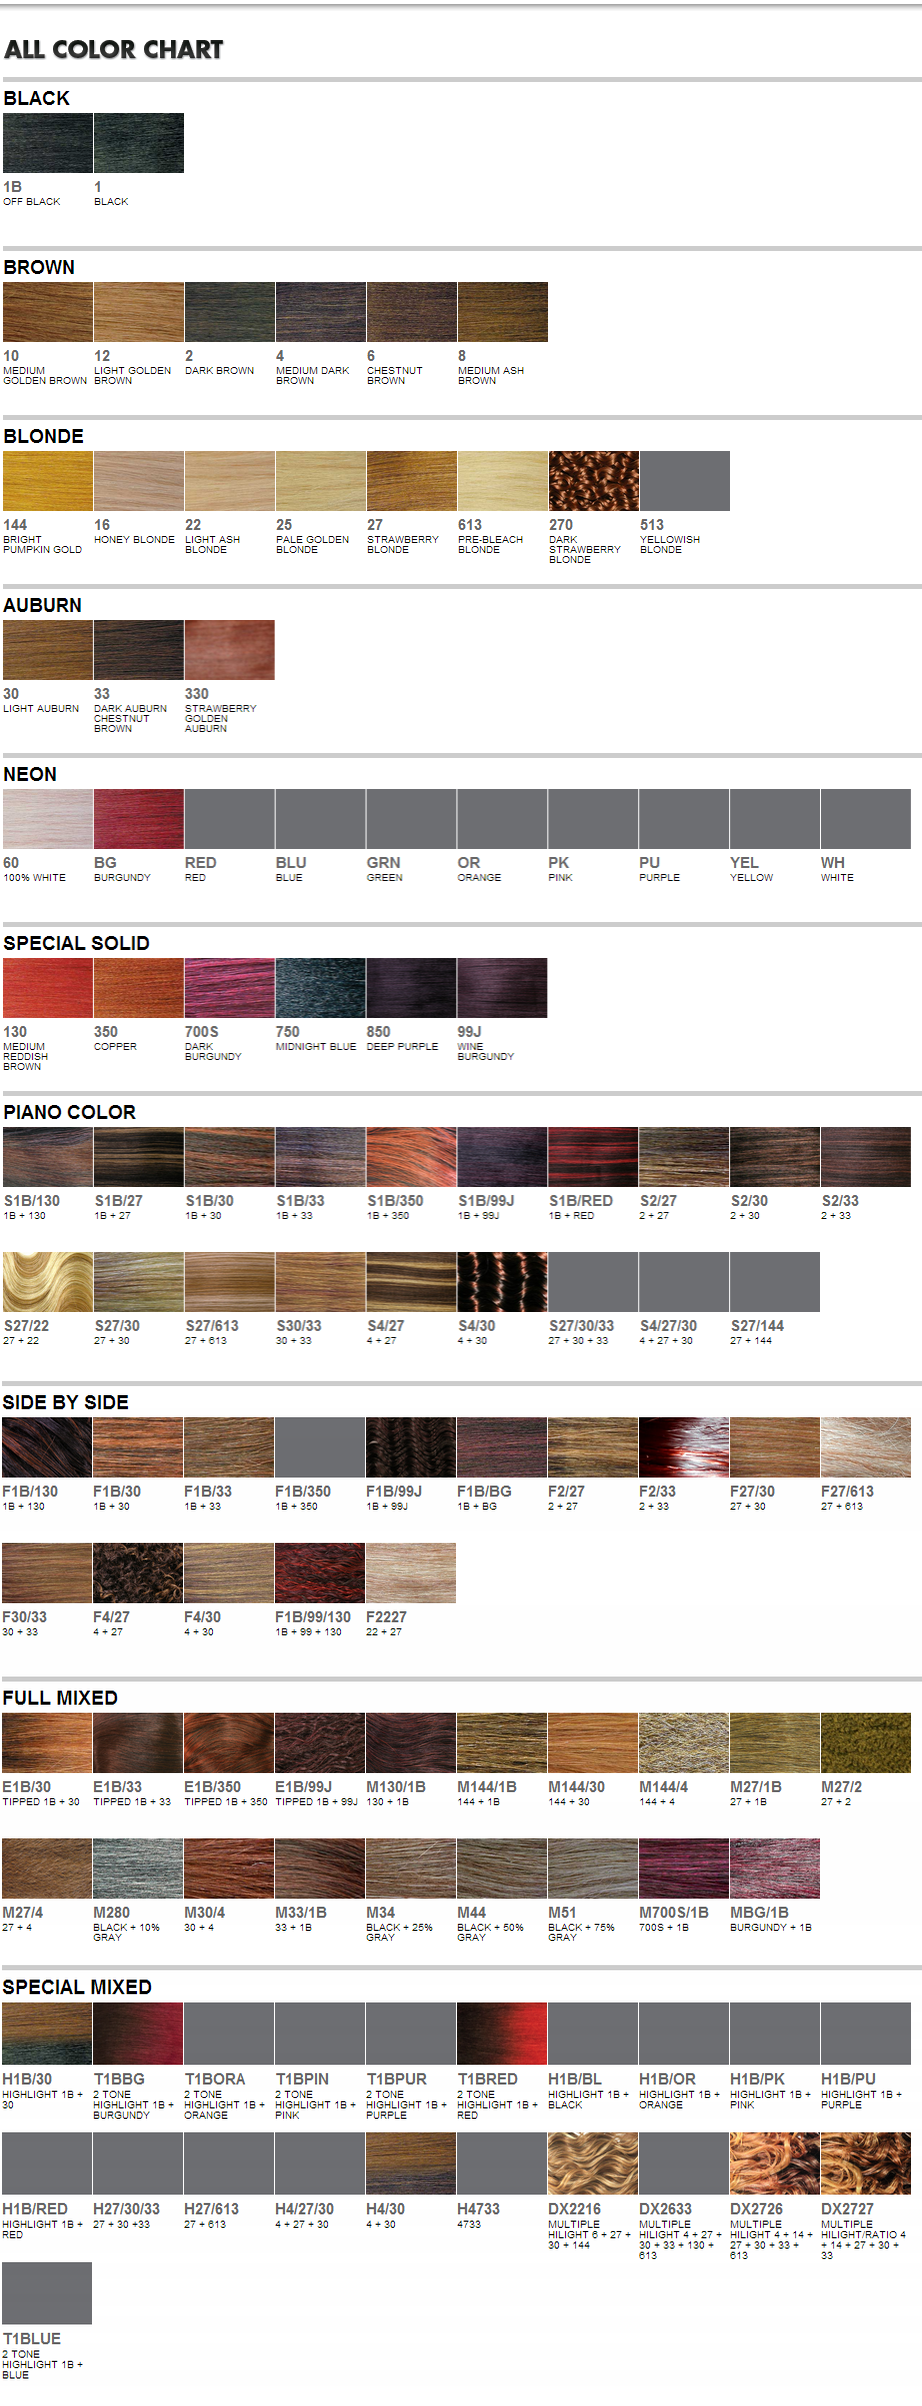 Wigextensionsale web pages sensationnel color chart sensationnel color chart wig extension sale nvjuhfo Gallery